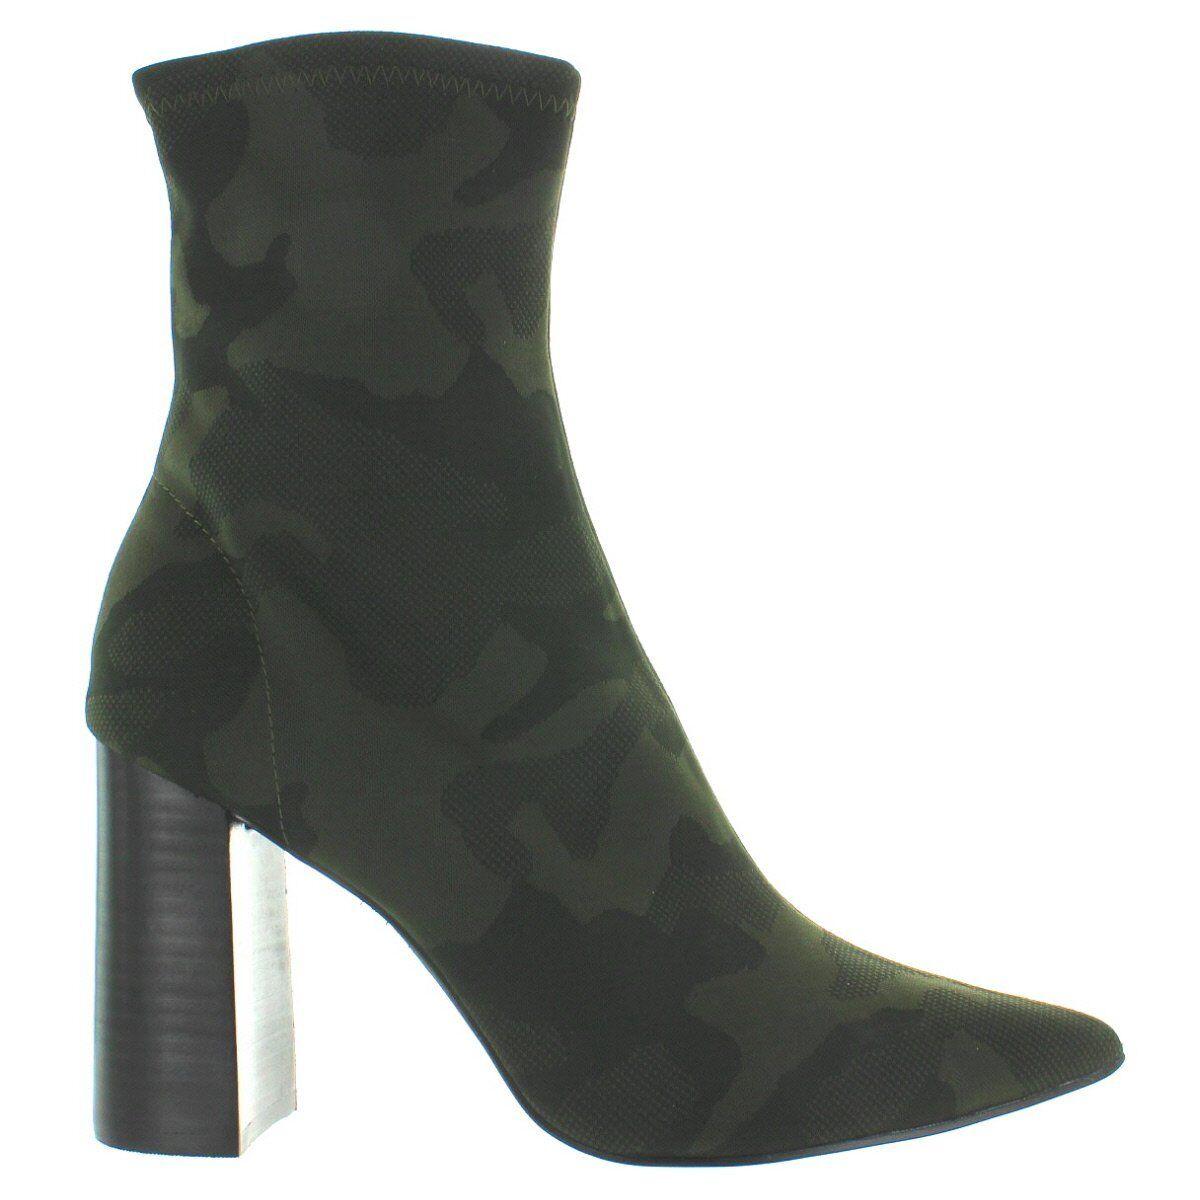 Jeffrey Campbell Siren - Khaki Black Camo Neoprene Boot